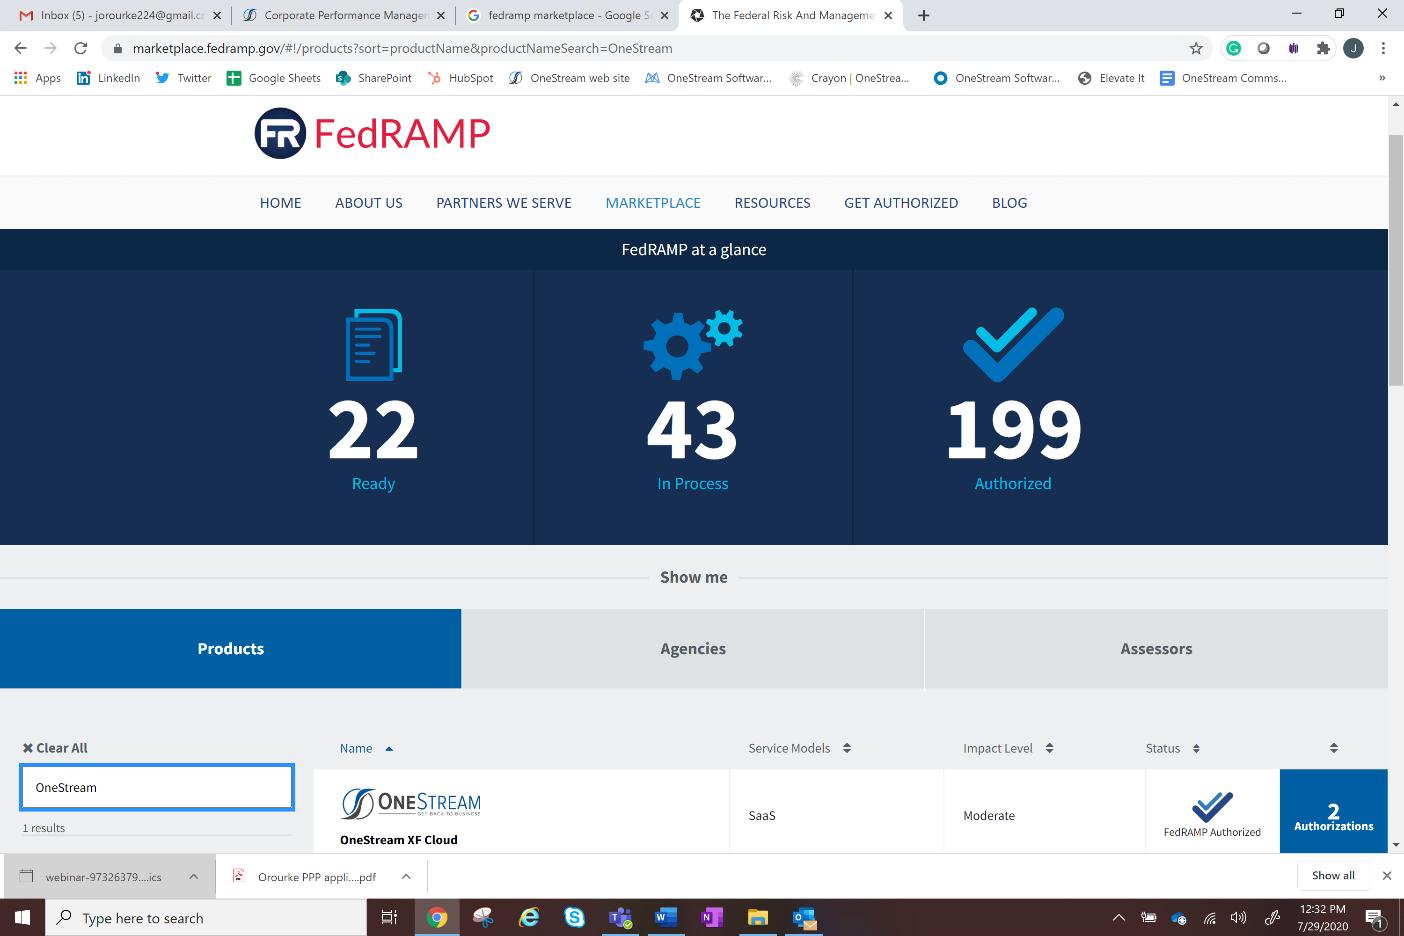 FedRAMP screenshot